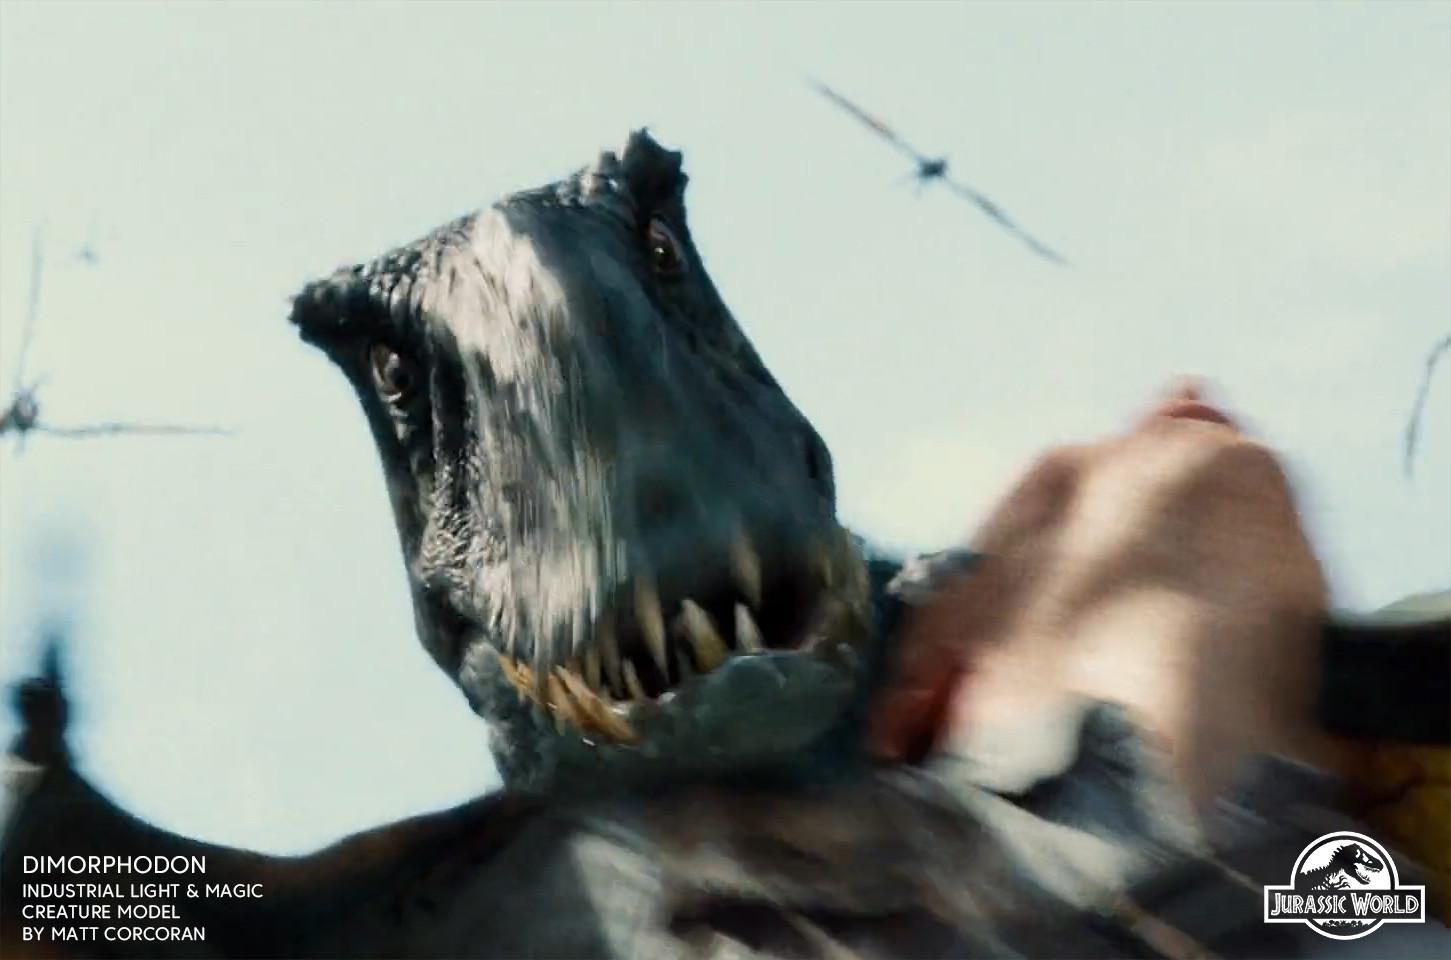 Matt corcoran jurassicworld dimorphodon 05